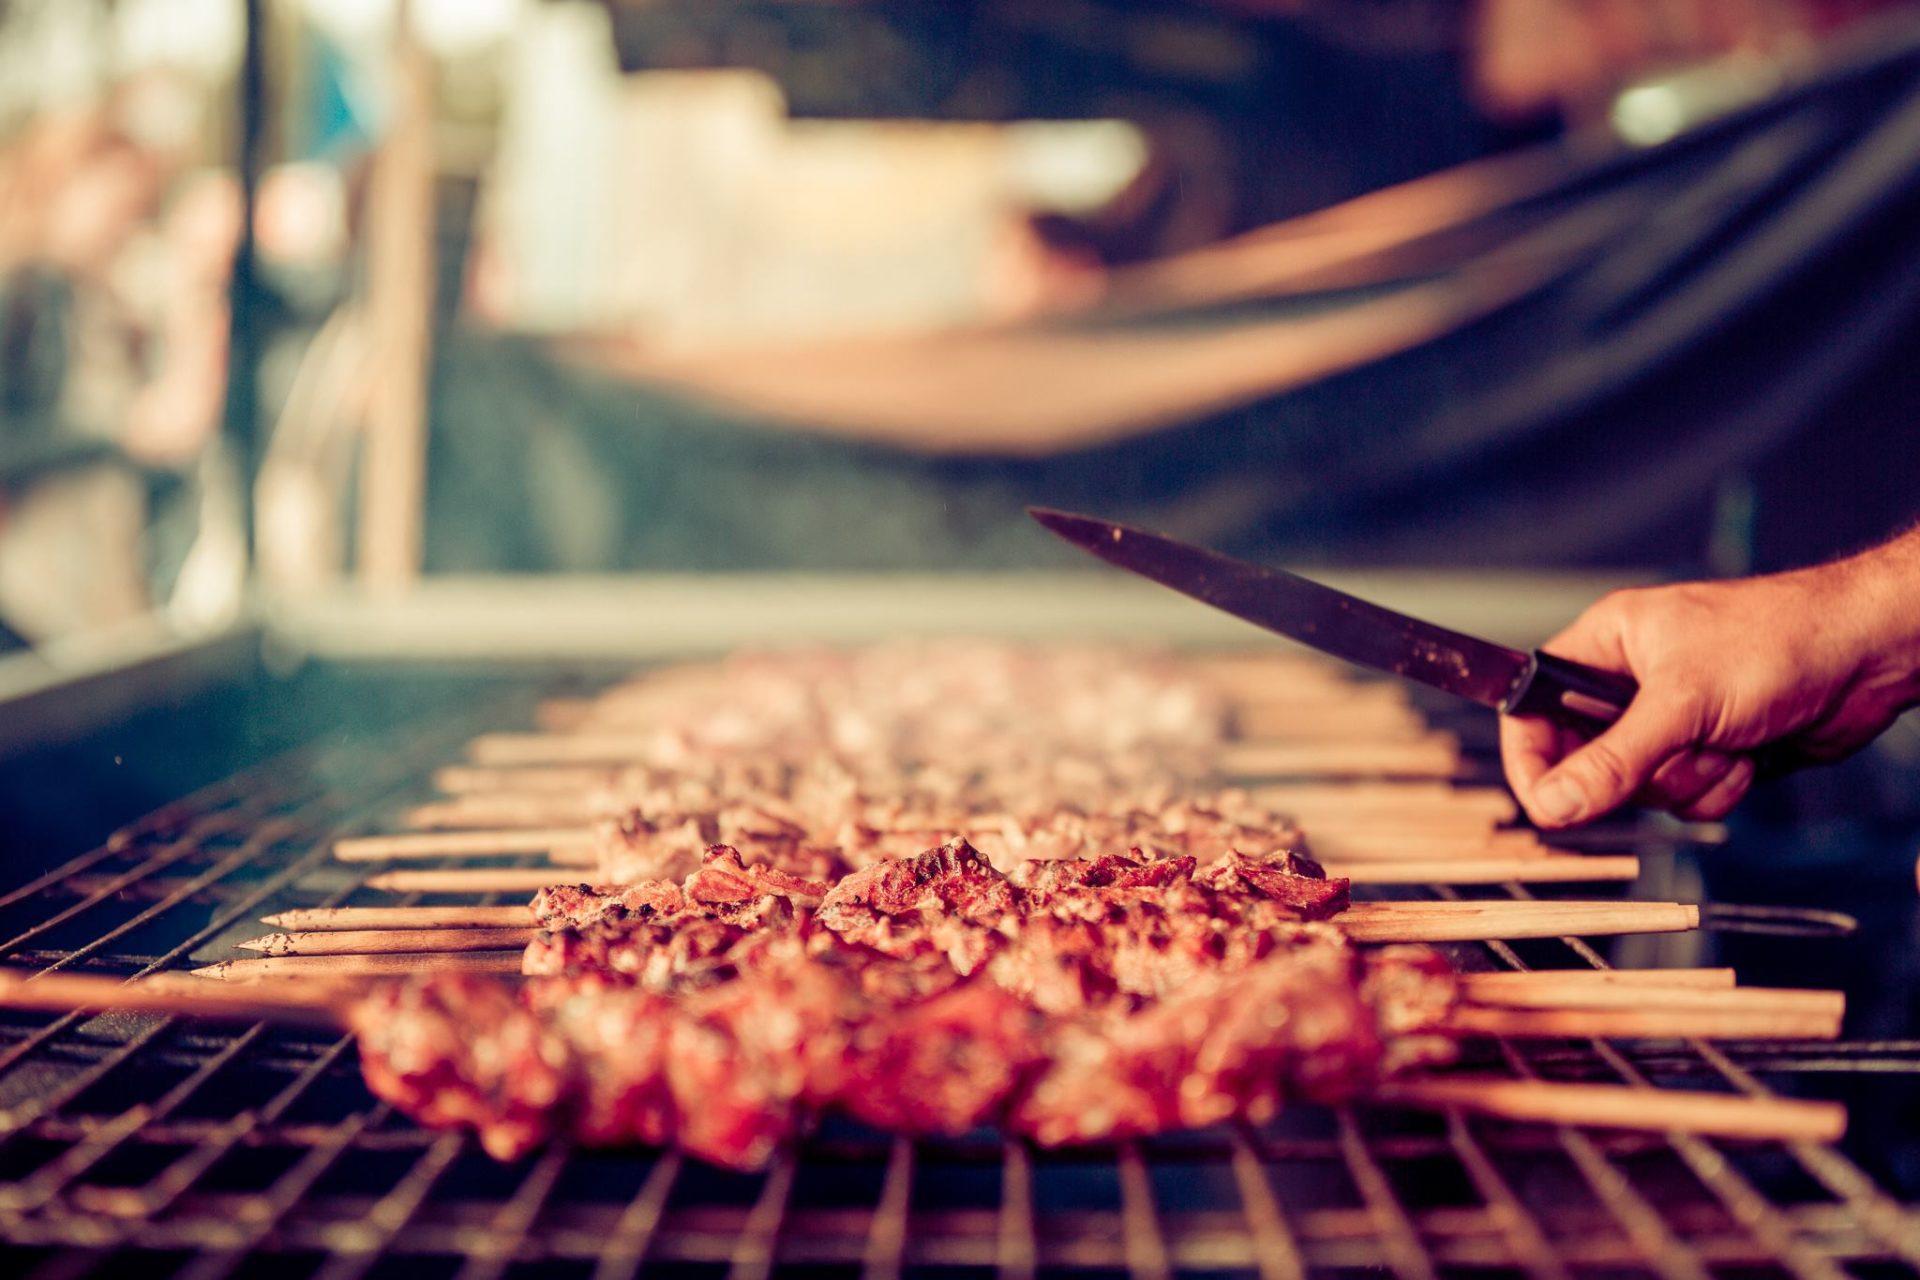 street food schmeckfestival spiesse